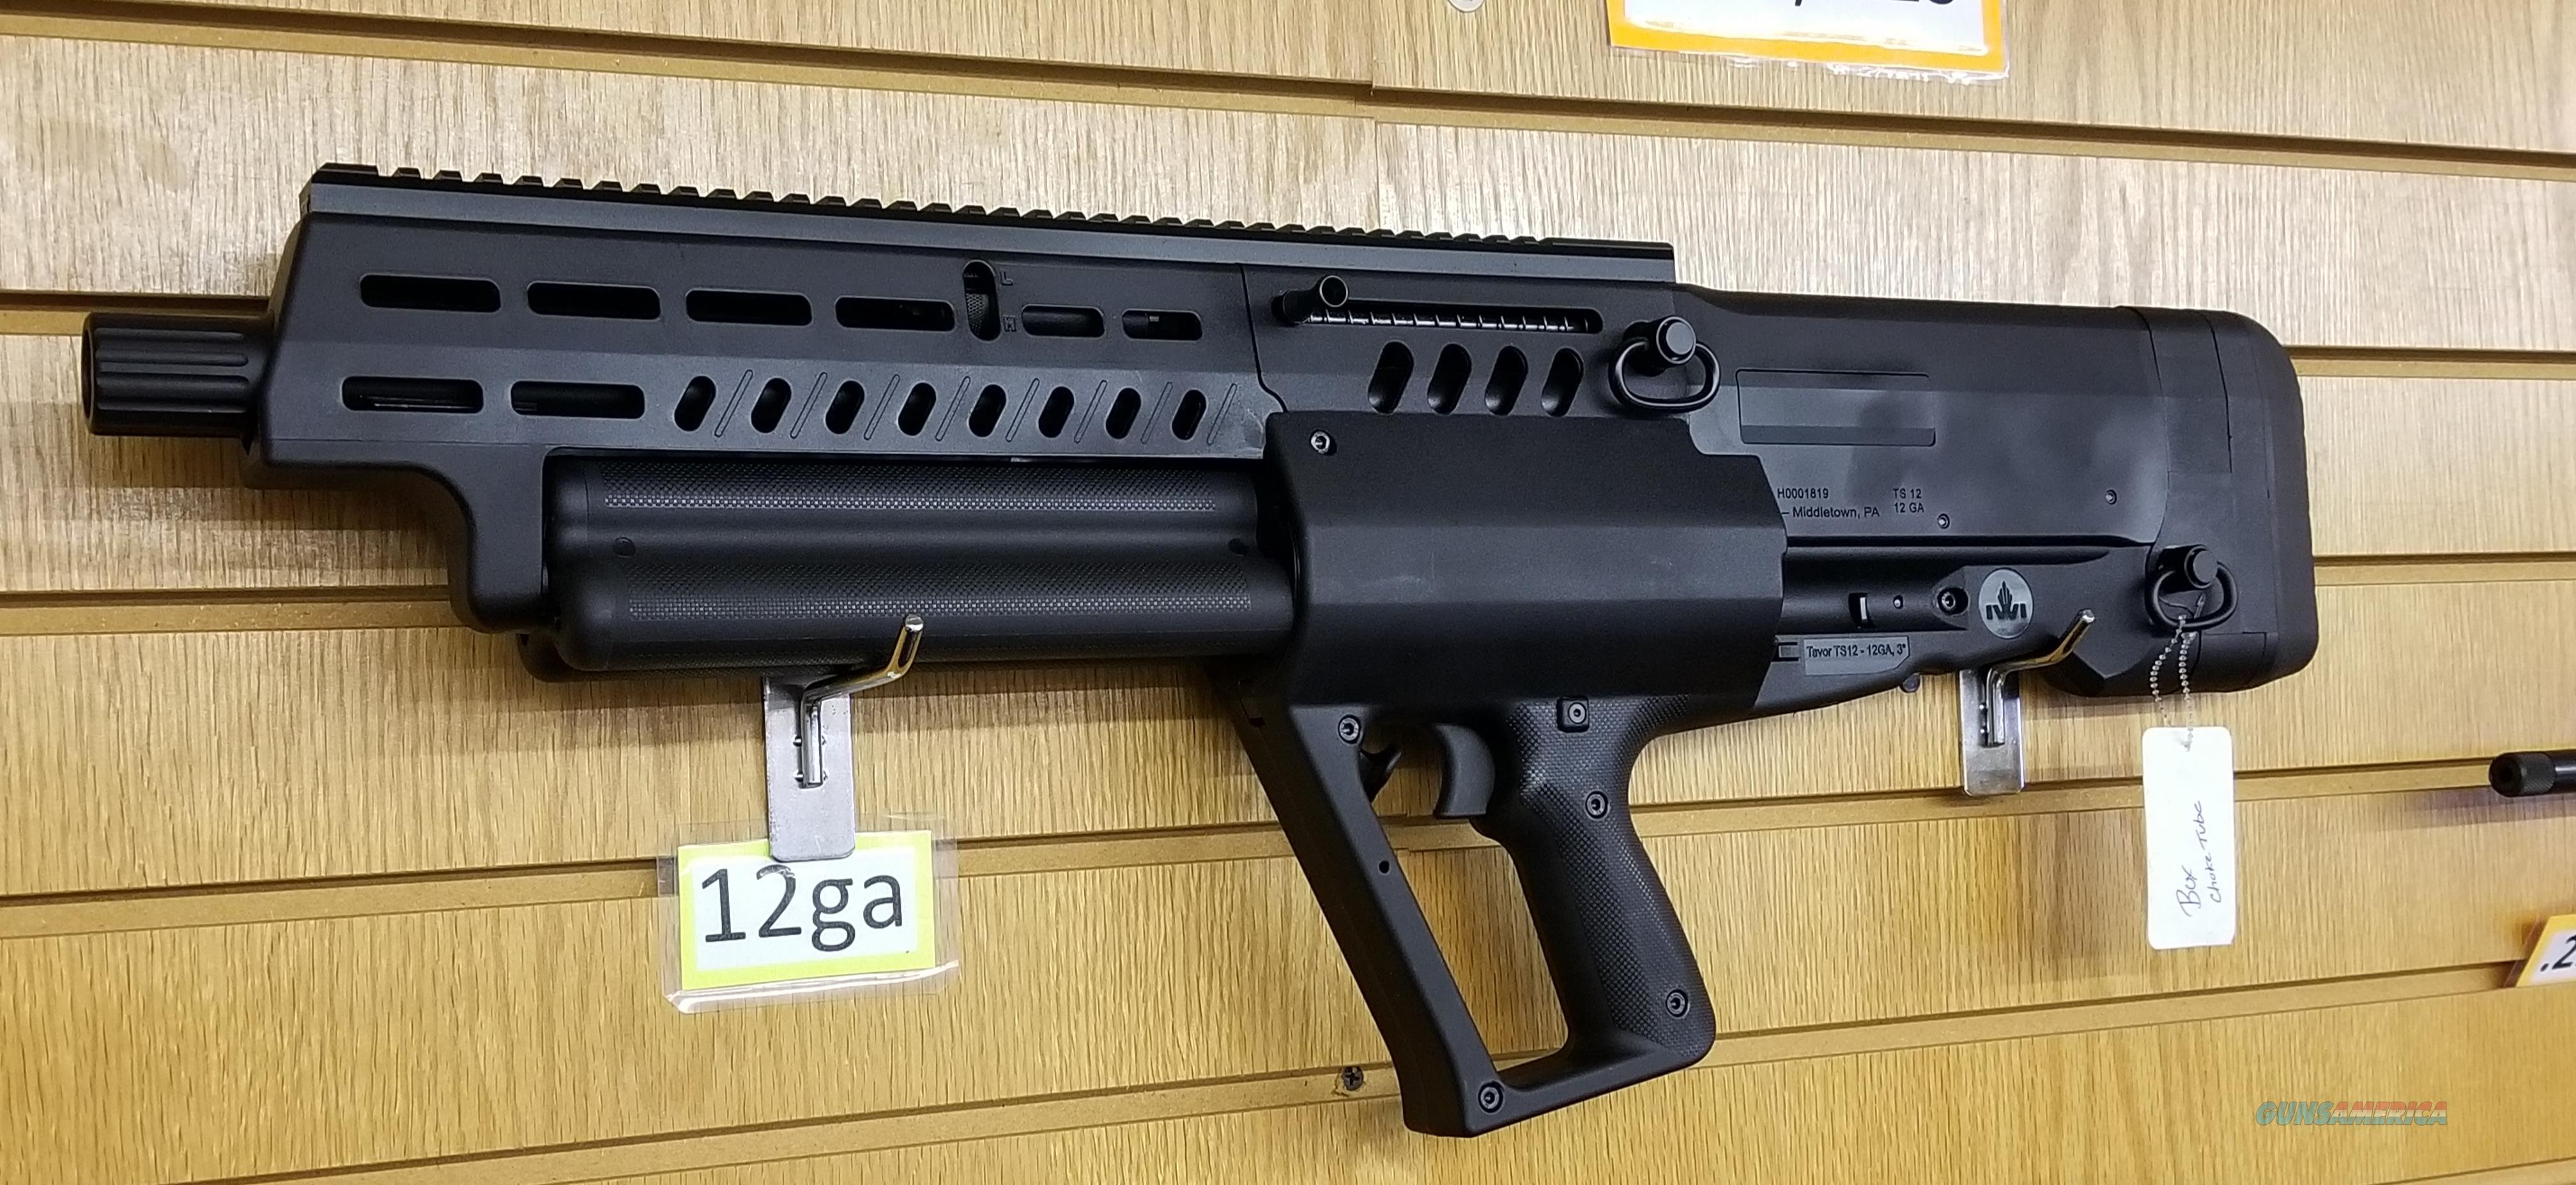 IWI Tavor TS12 Tactical Shotgun - NEW - Free Shipping  Guns > Shotguns > IJ Misc Shotguns